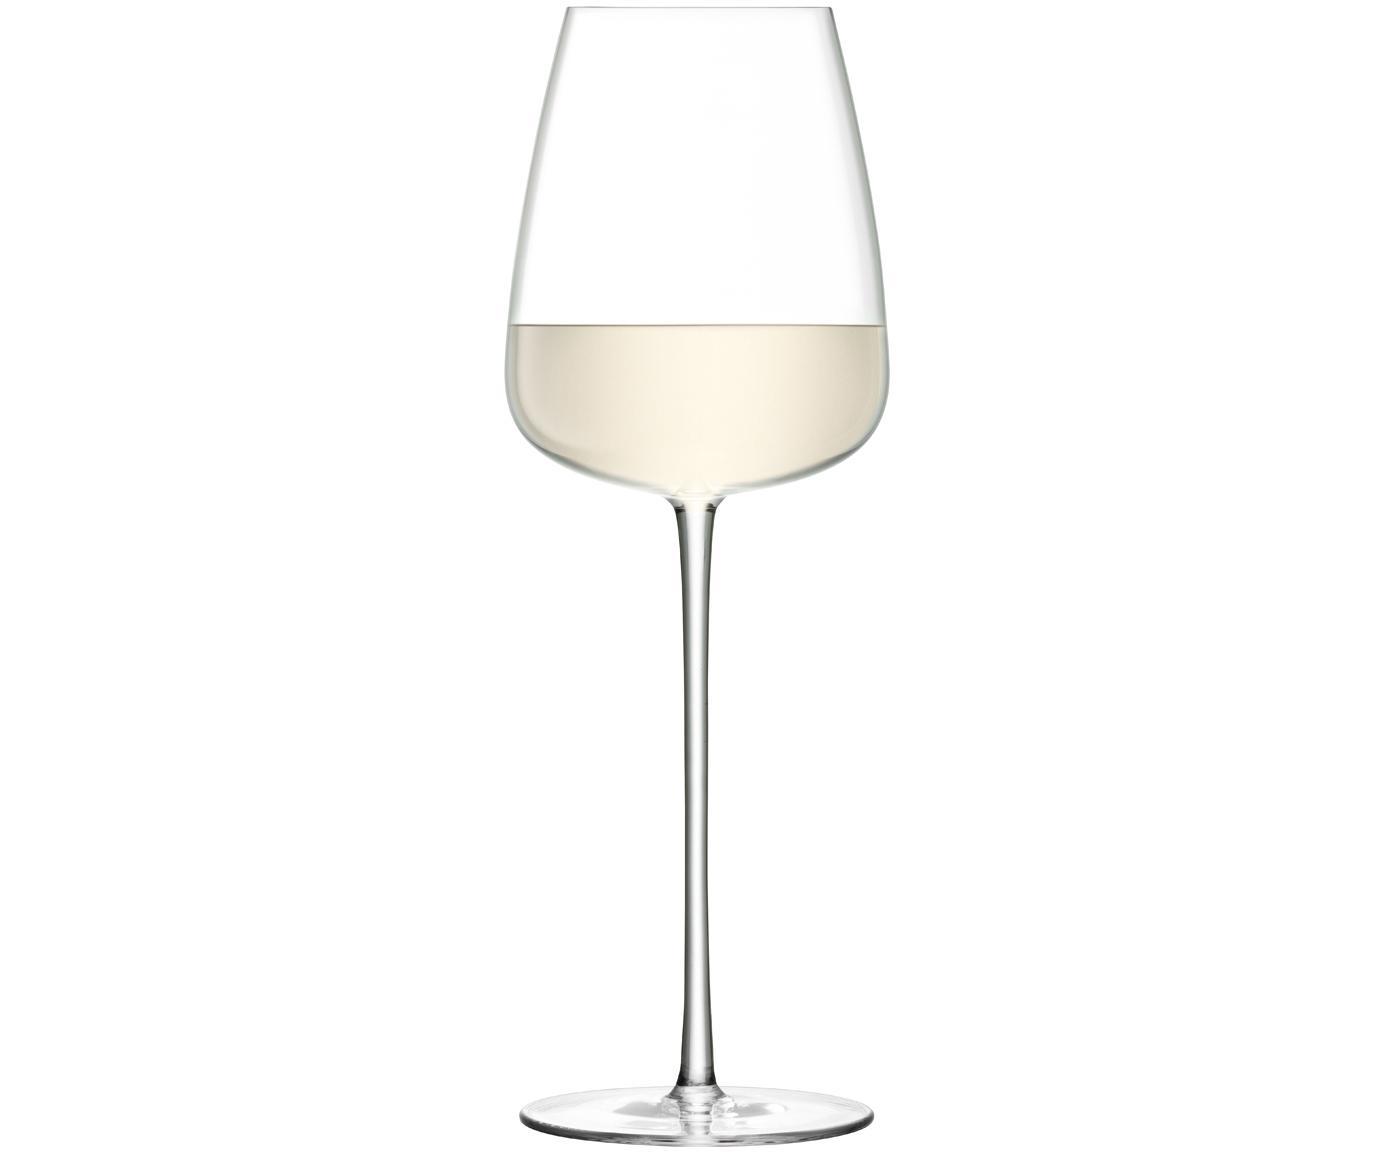 Copas de vino blanco de vidrio soplado Wine Culture, 2uds., Vidrio, Transparente, Ø 9 x Al 26 cm